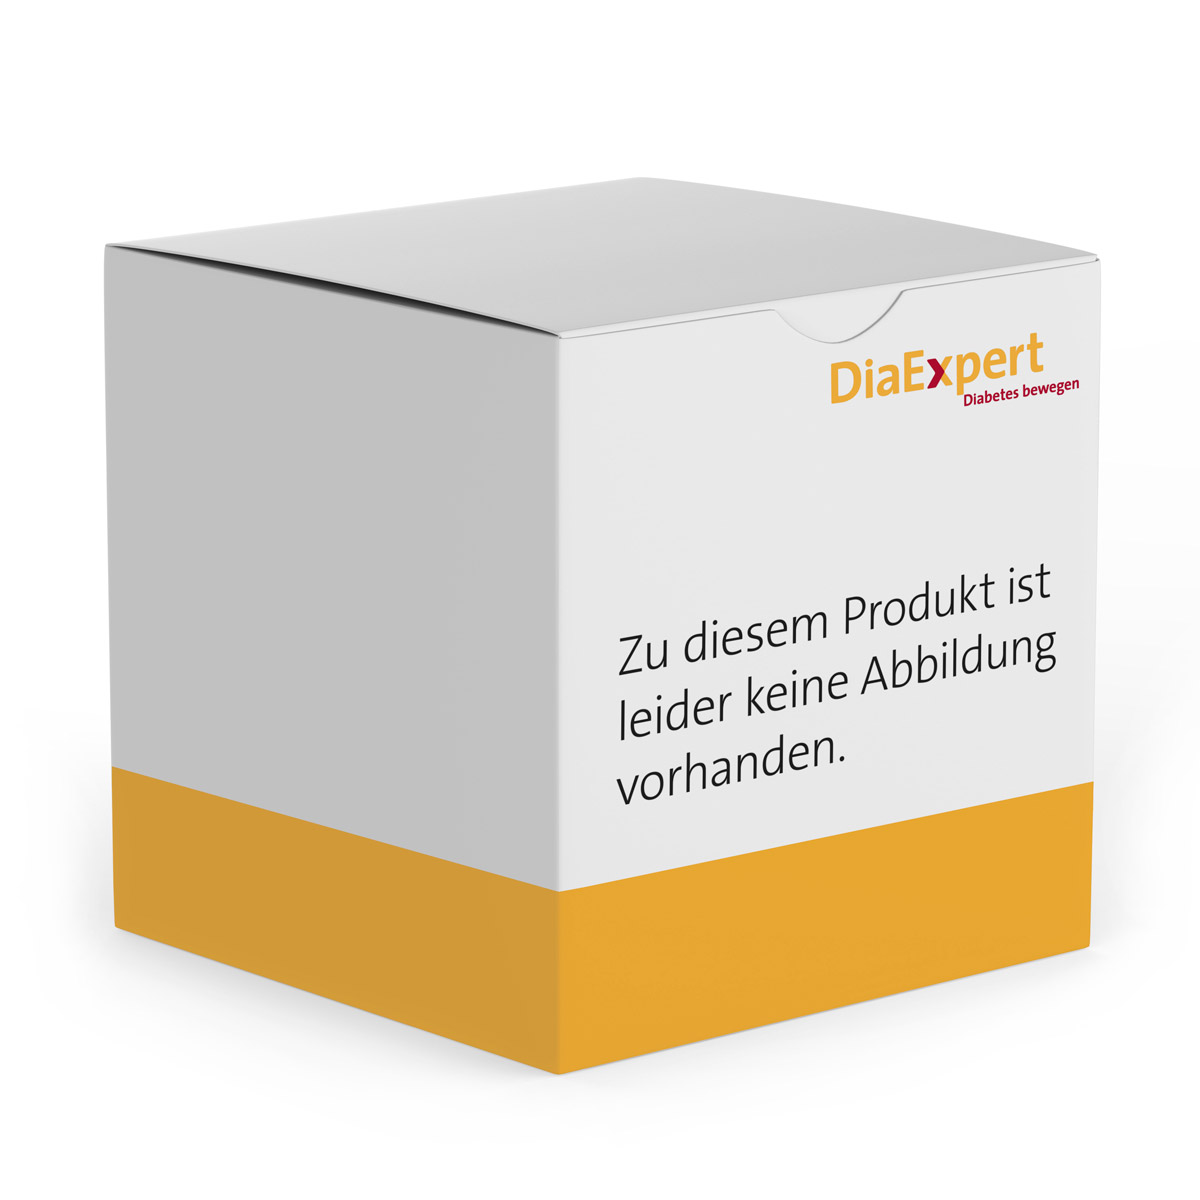 DiaExpert Katalog